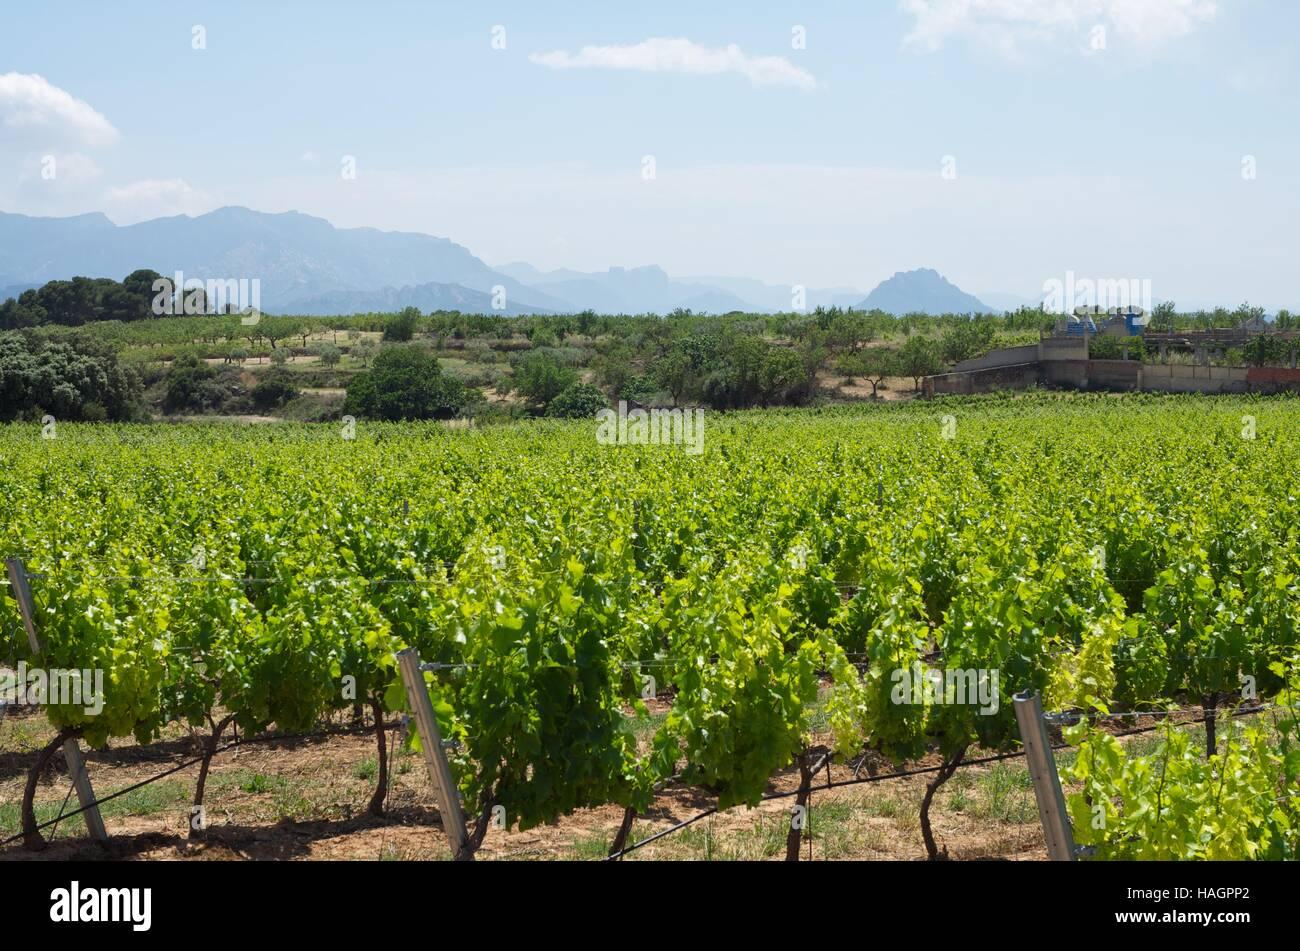 Vineyards near Horta de Sant Joan, and Els Ports Natural Park on the horizon, Tarragona, Spain - Stock Image